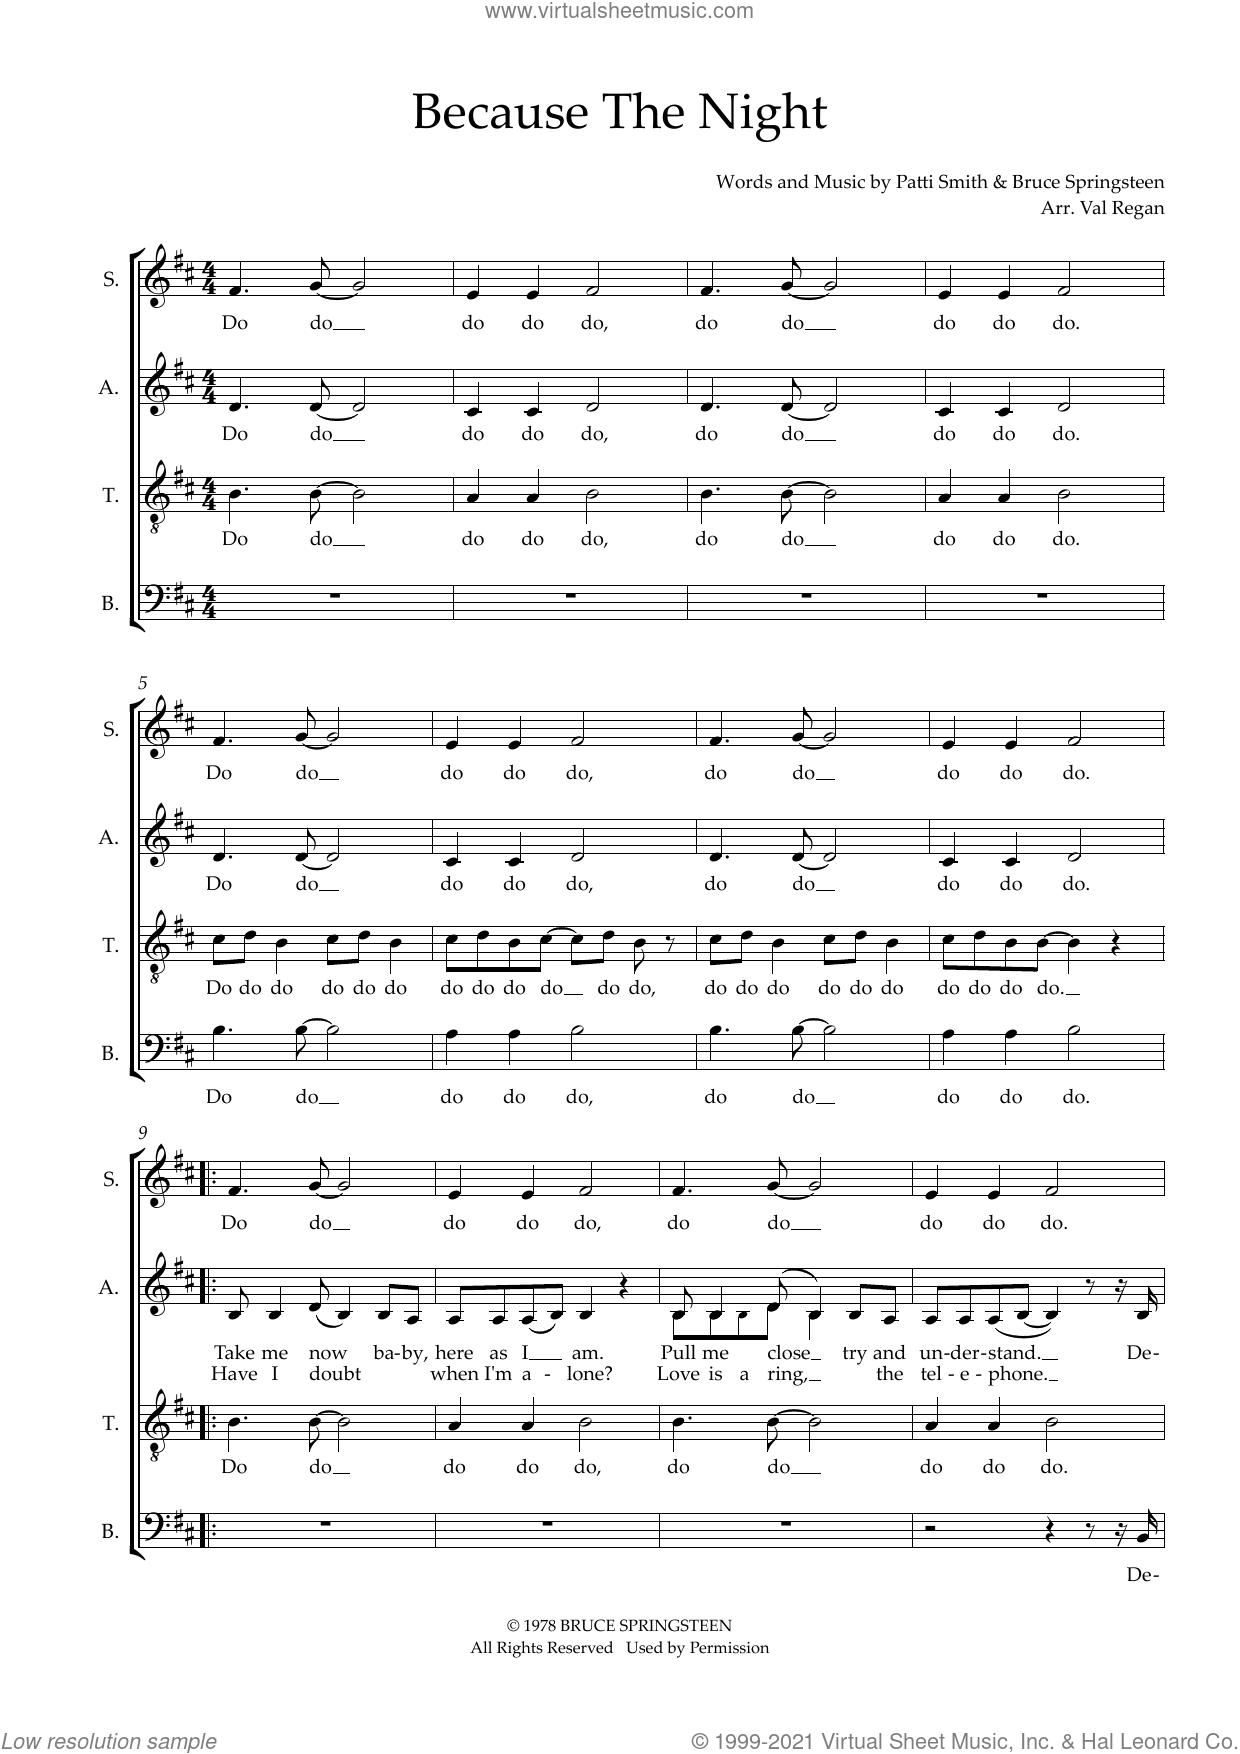 Because The Night (arr. Val Regan) sheet music for choir (SATB: soprano, alto, tenor, bass) by Patti Smith, Val Regan and Bruce Springsteen, intermediate skill level